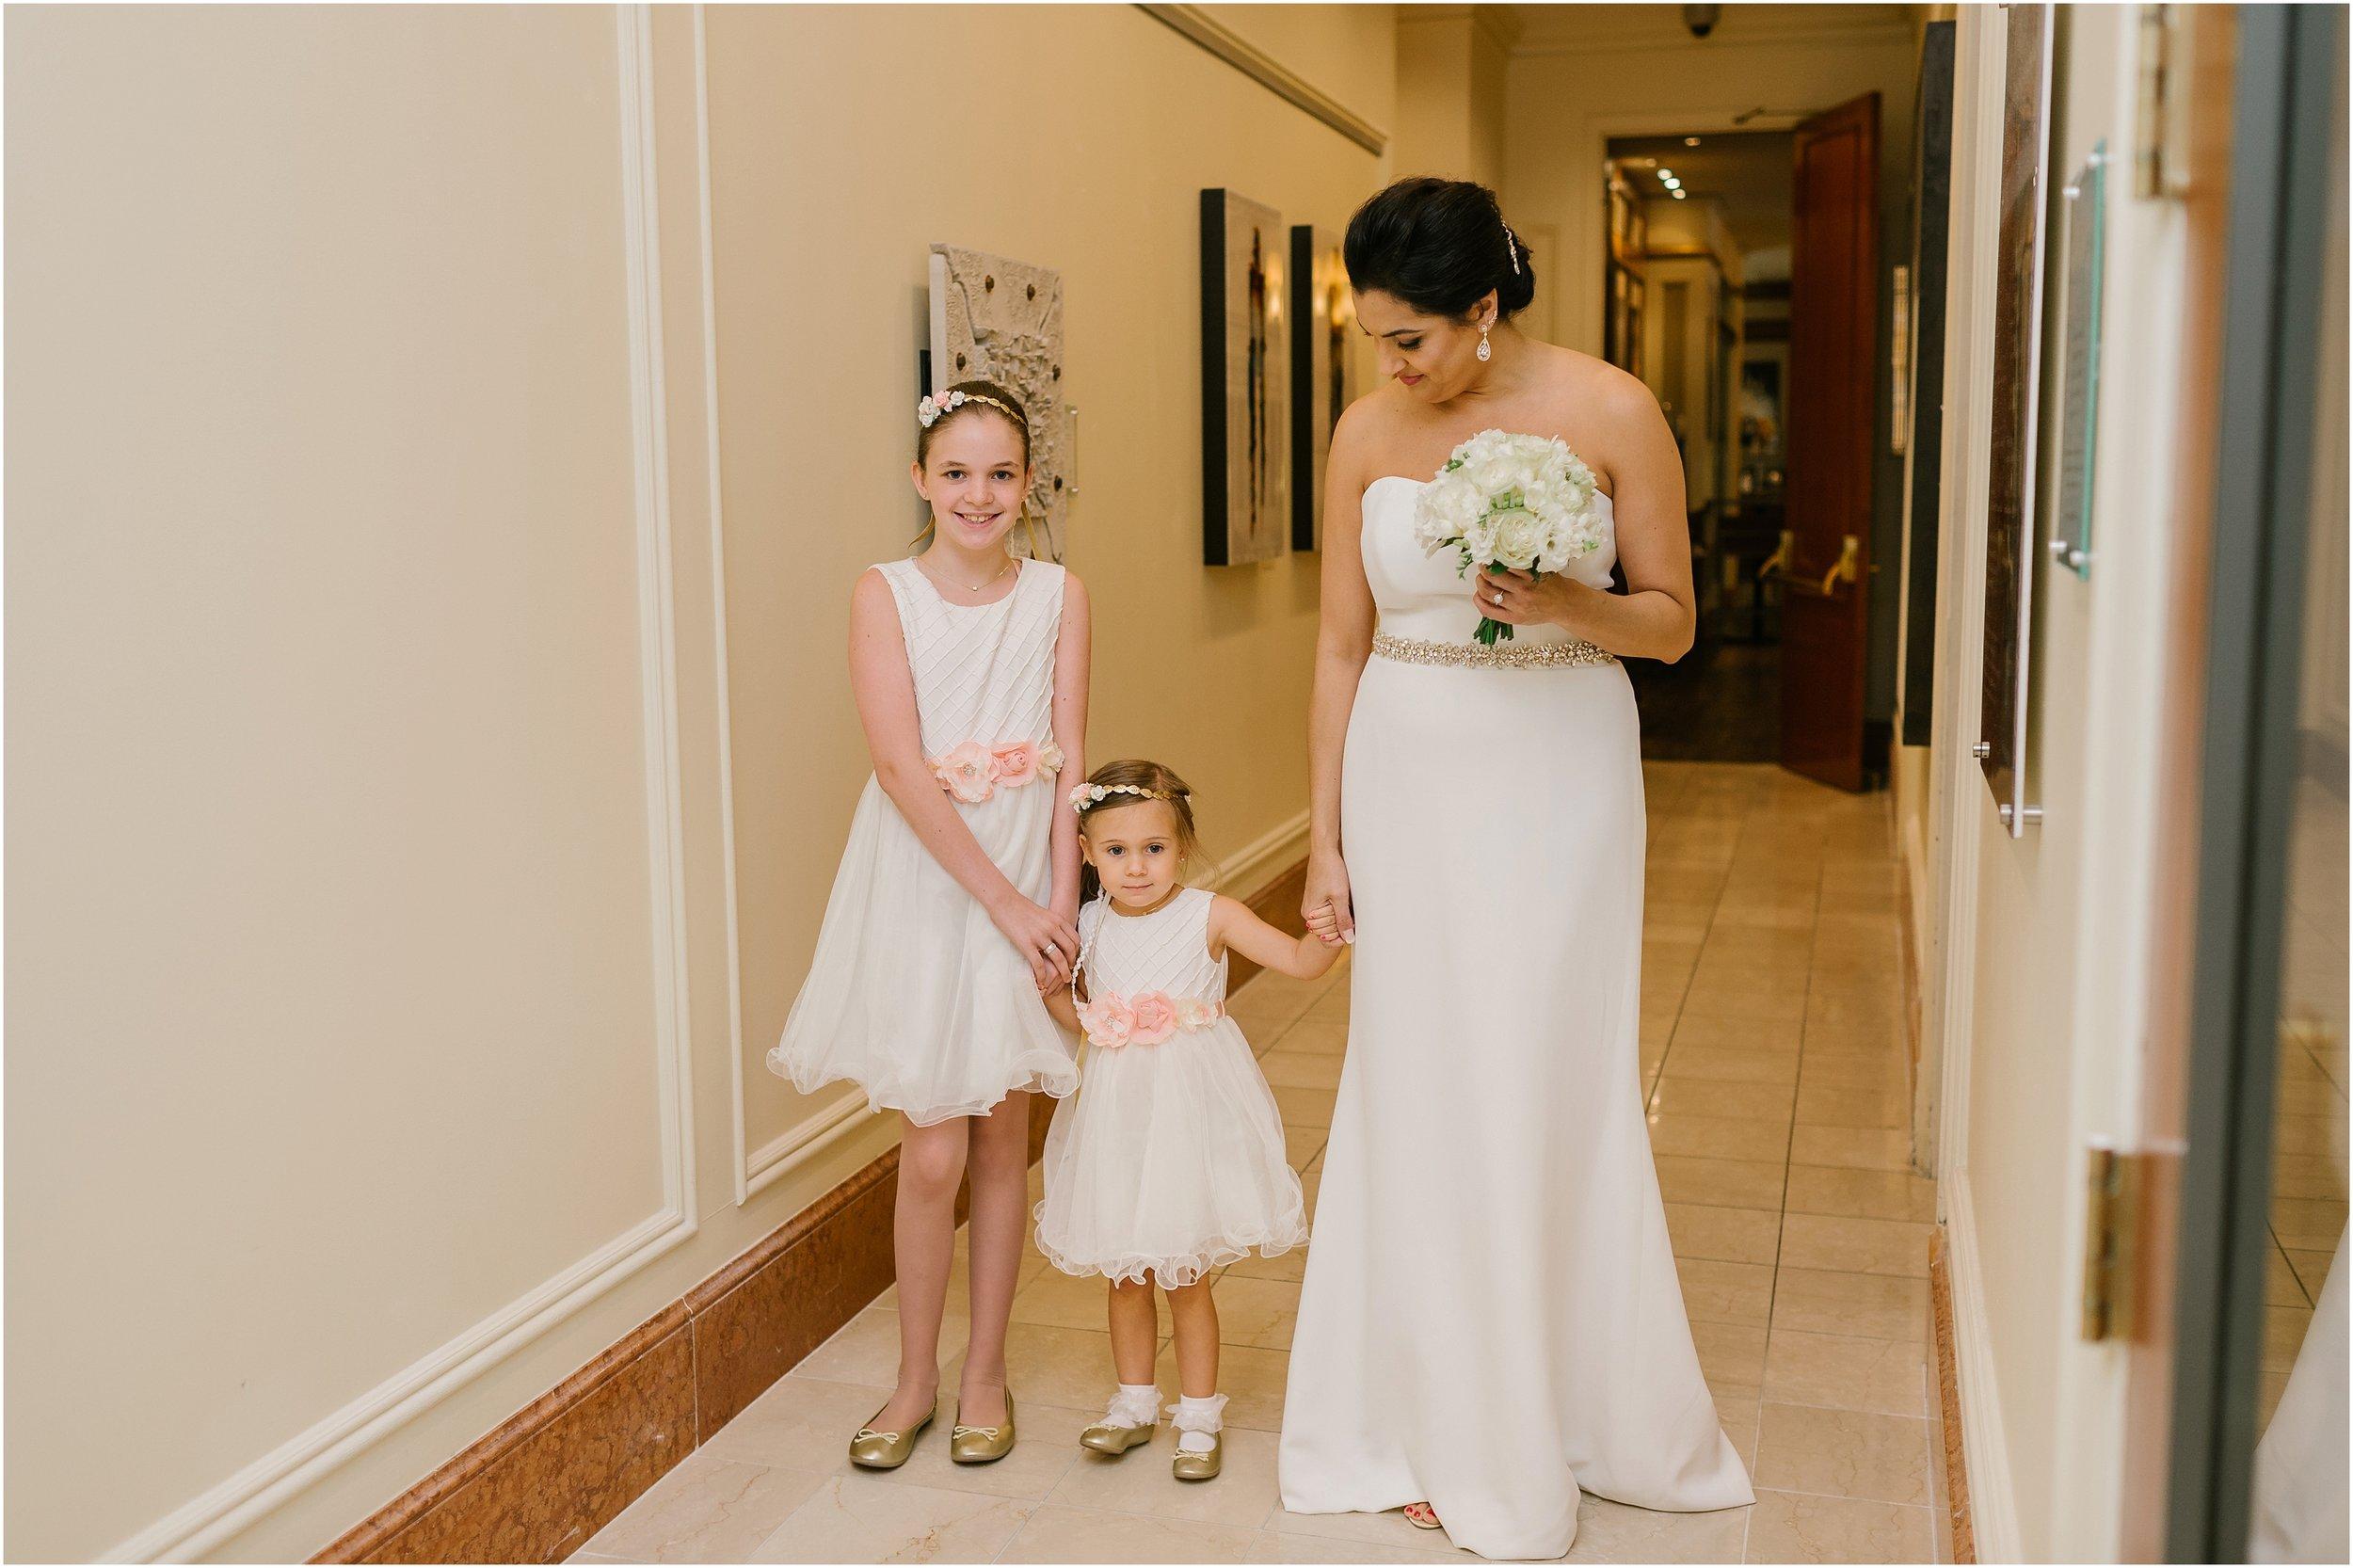 Rebecca_Shehorn_Photography_Indianapolis_Wedding_Photographer_8555.jpg